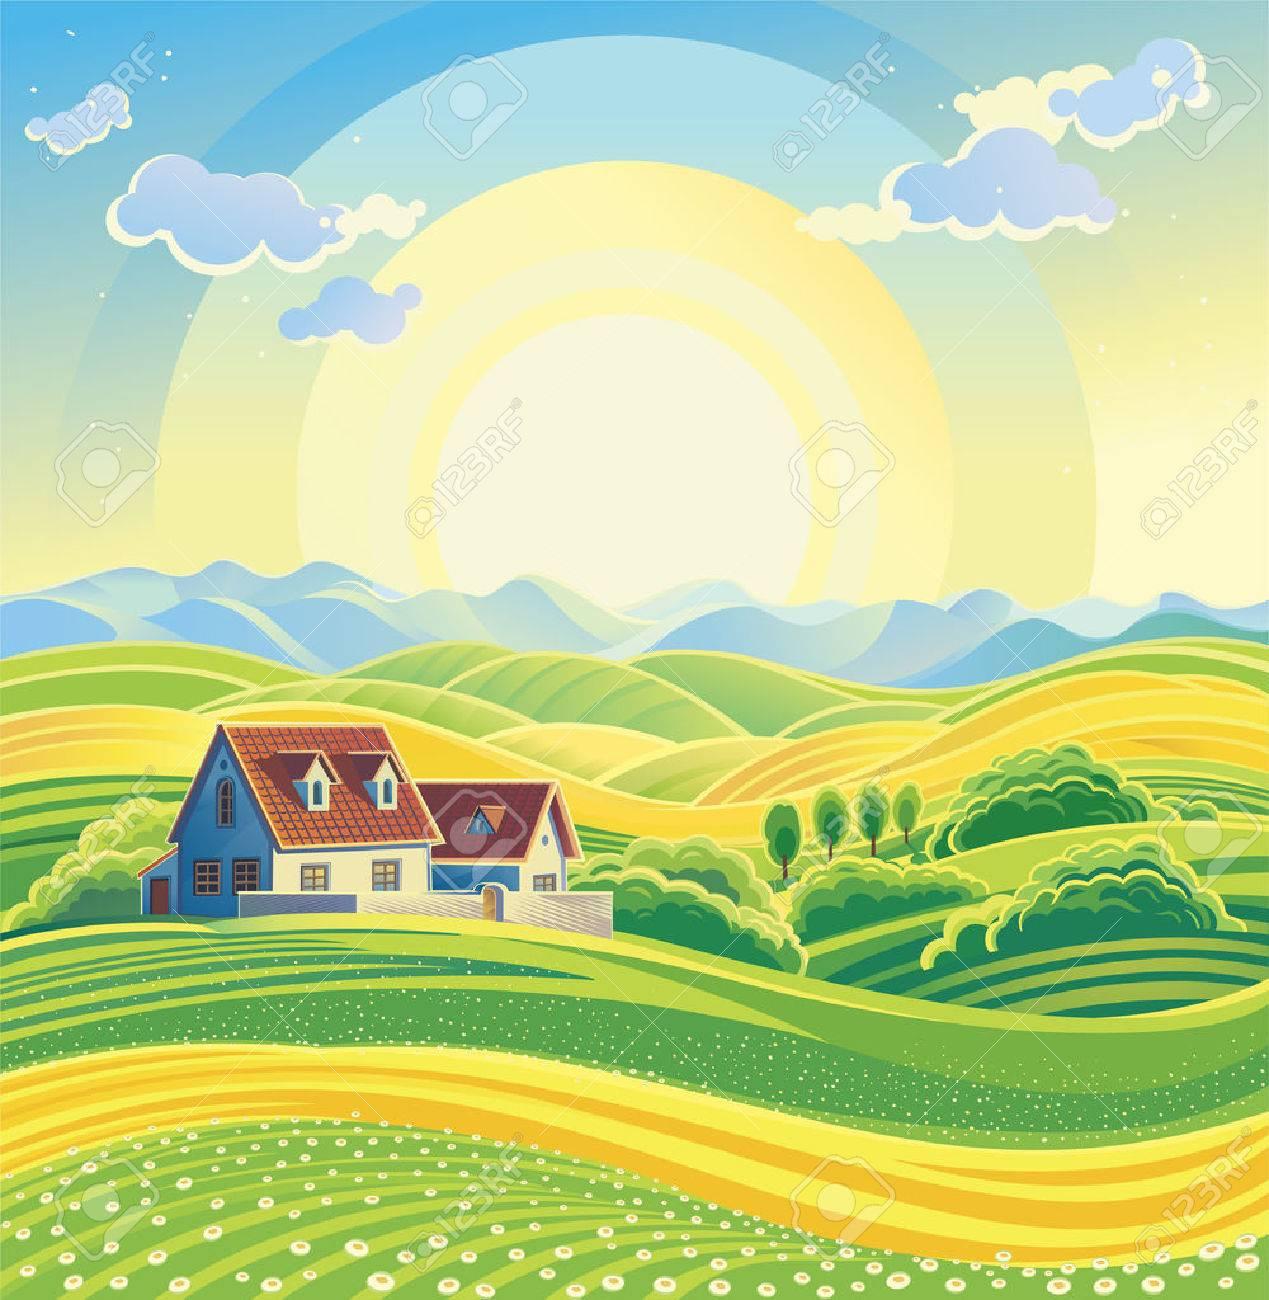 Sunny summer landscape with village. - 53134303